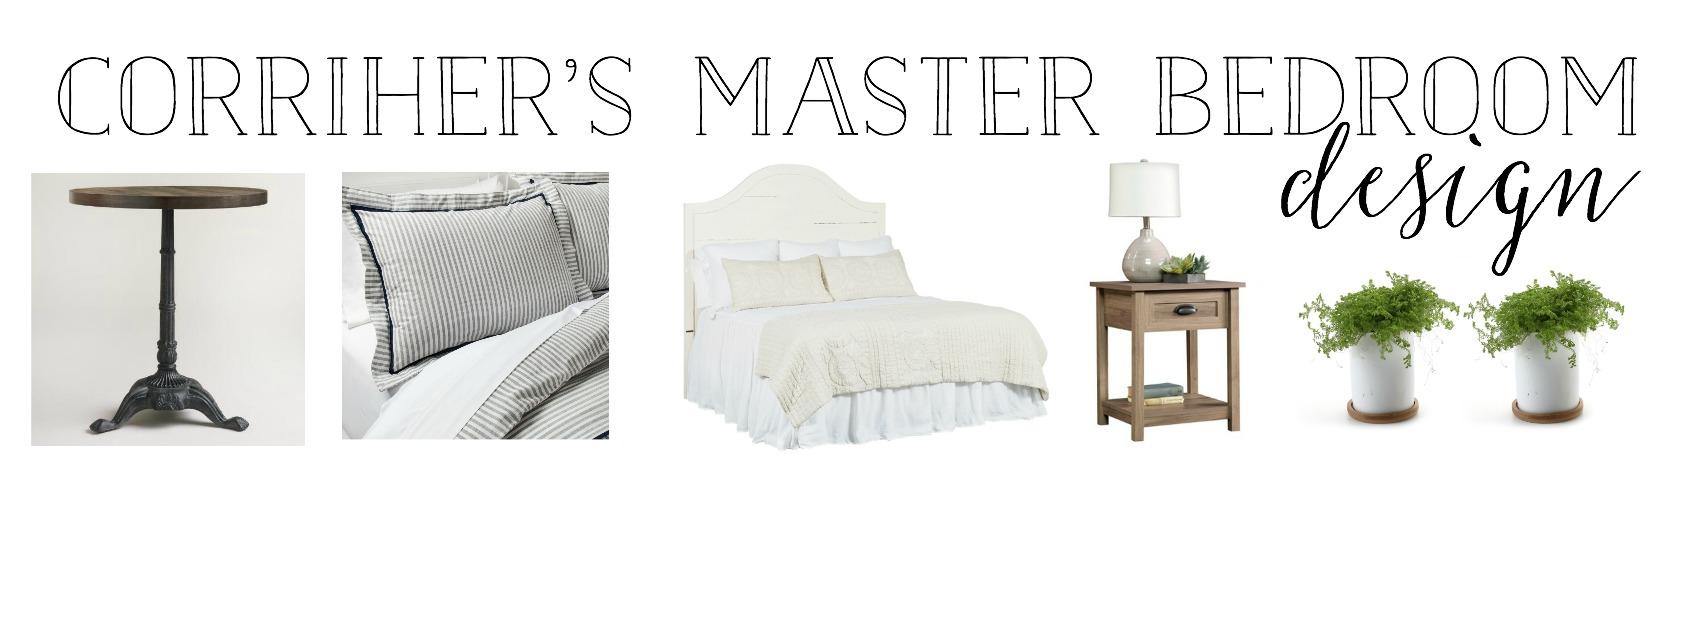 The Simple Abode's Master Bedroom Design Plan- Interior Design by Plum Pretty Decor and Design